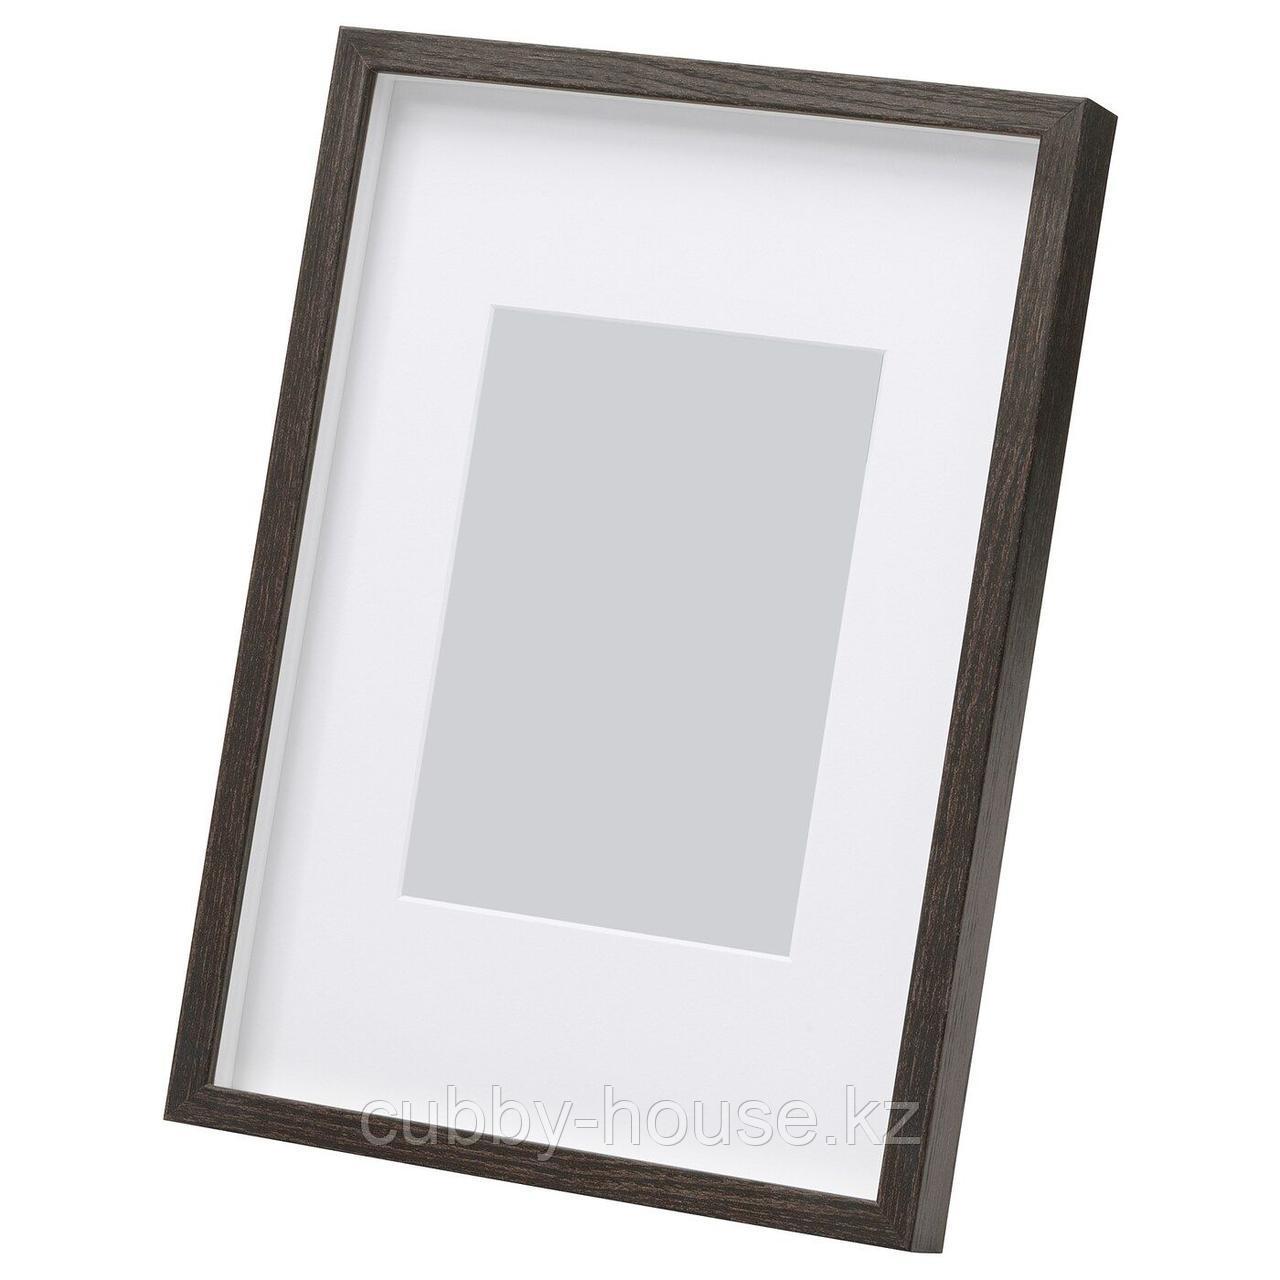 ХОВСТА Рама, темно-коричневый, 13x18 см